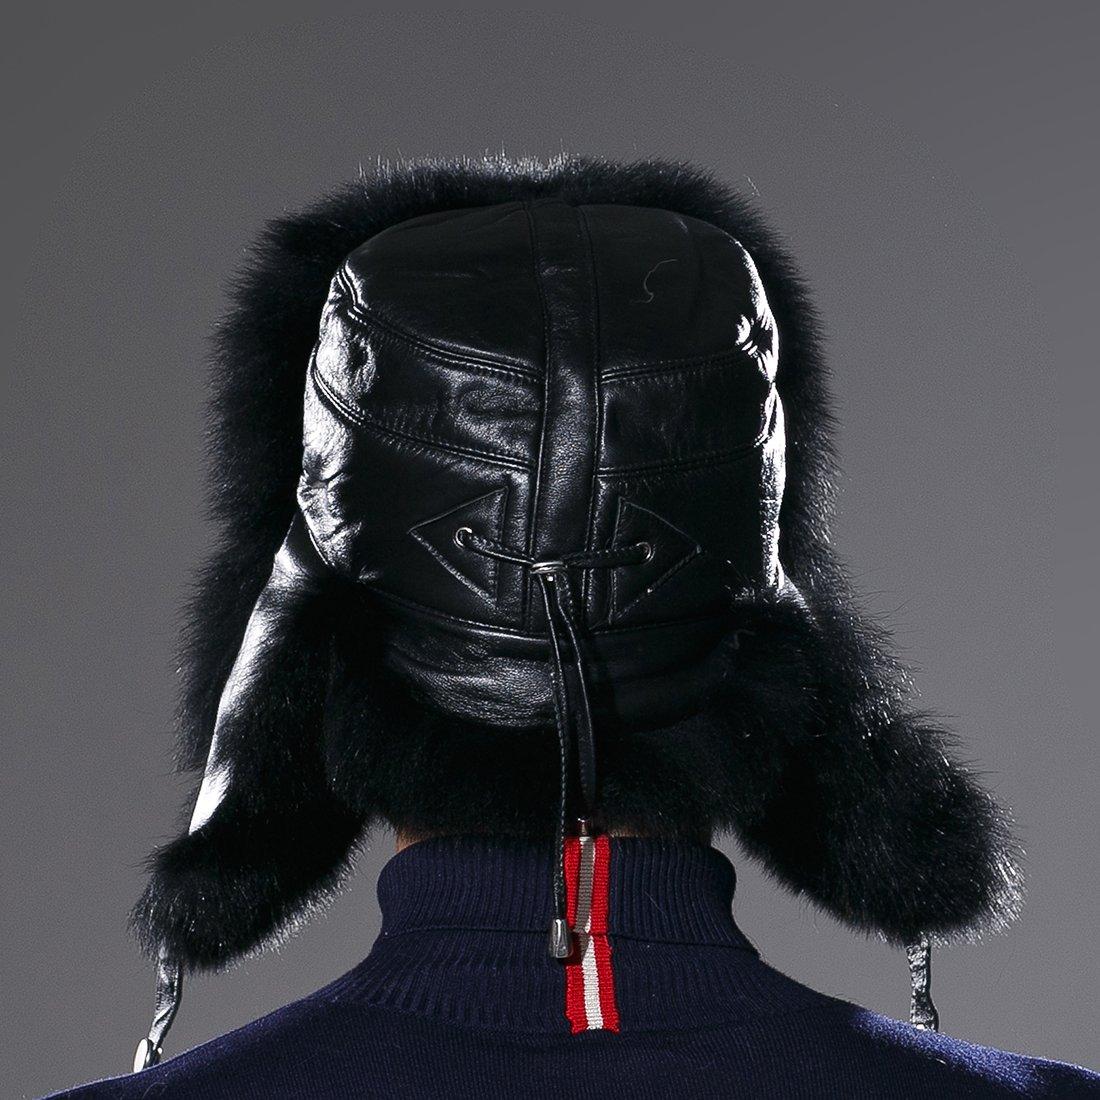 URSFUR Winter Russian Fur Hat Mens Real Fox Fur Ushanka Trapper Cap Black by URSFUR (Image #6)